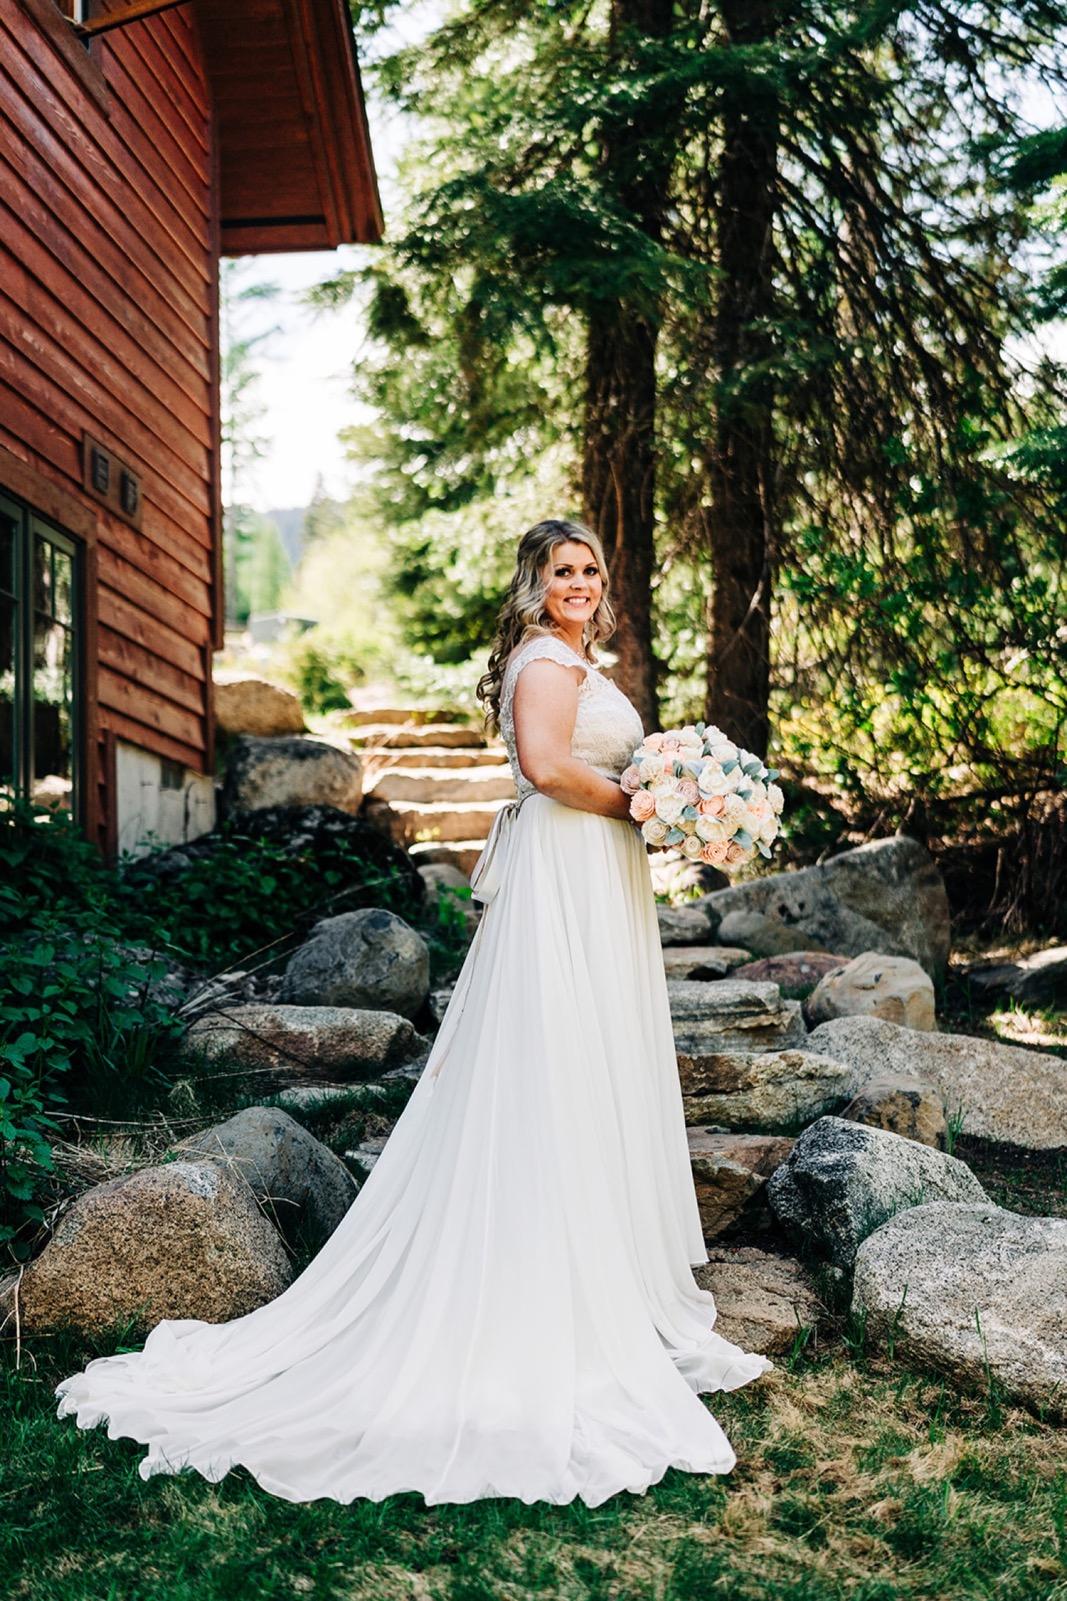 036_falissa_heather_wedding-103.jpg